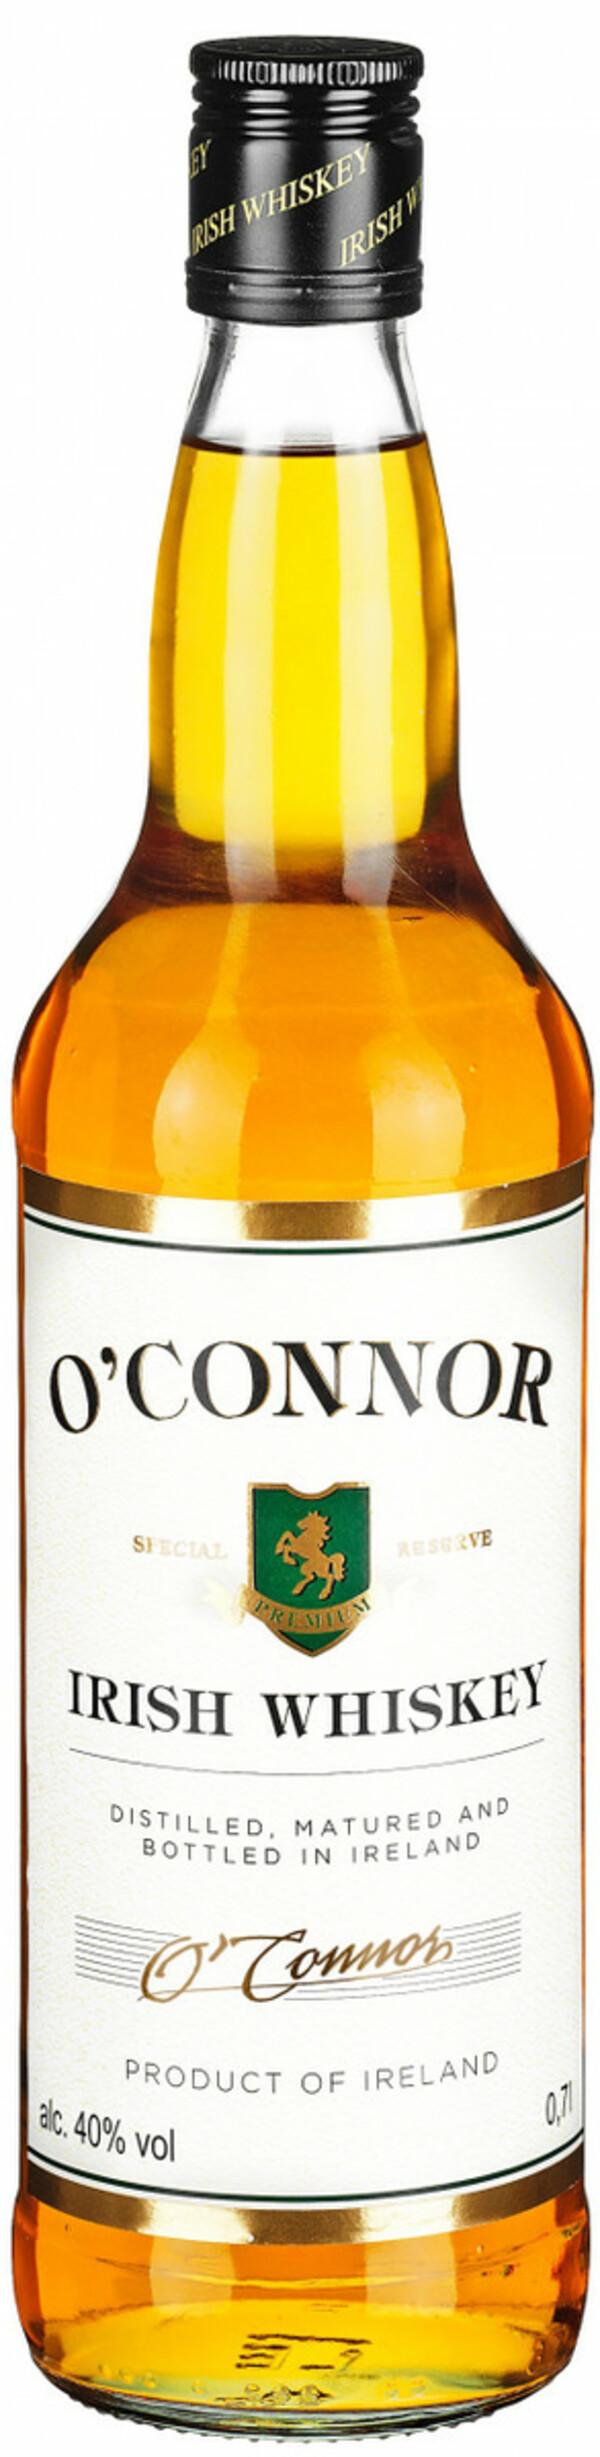 O'Connor Irish Whiskey